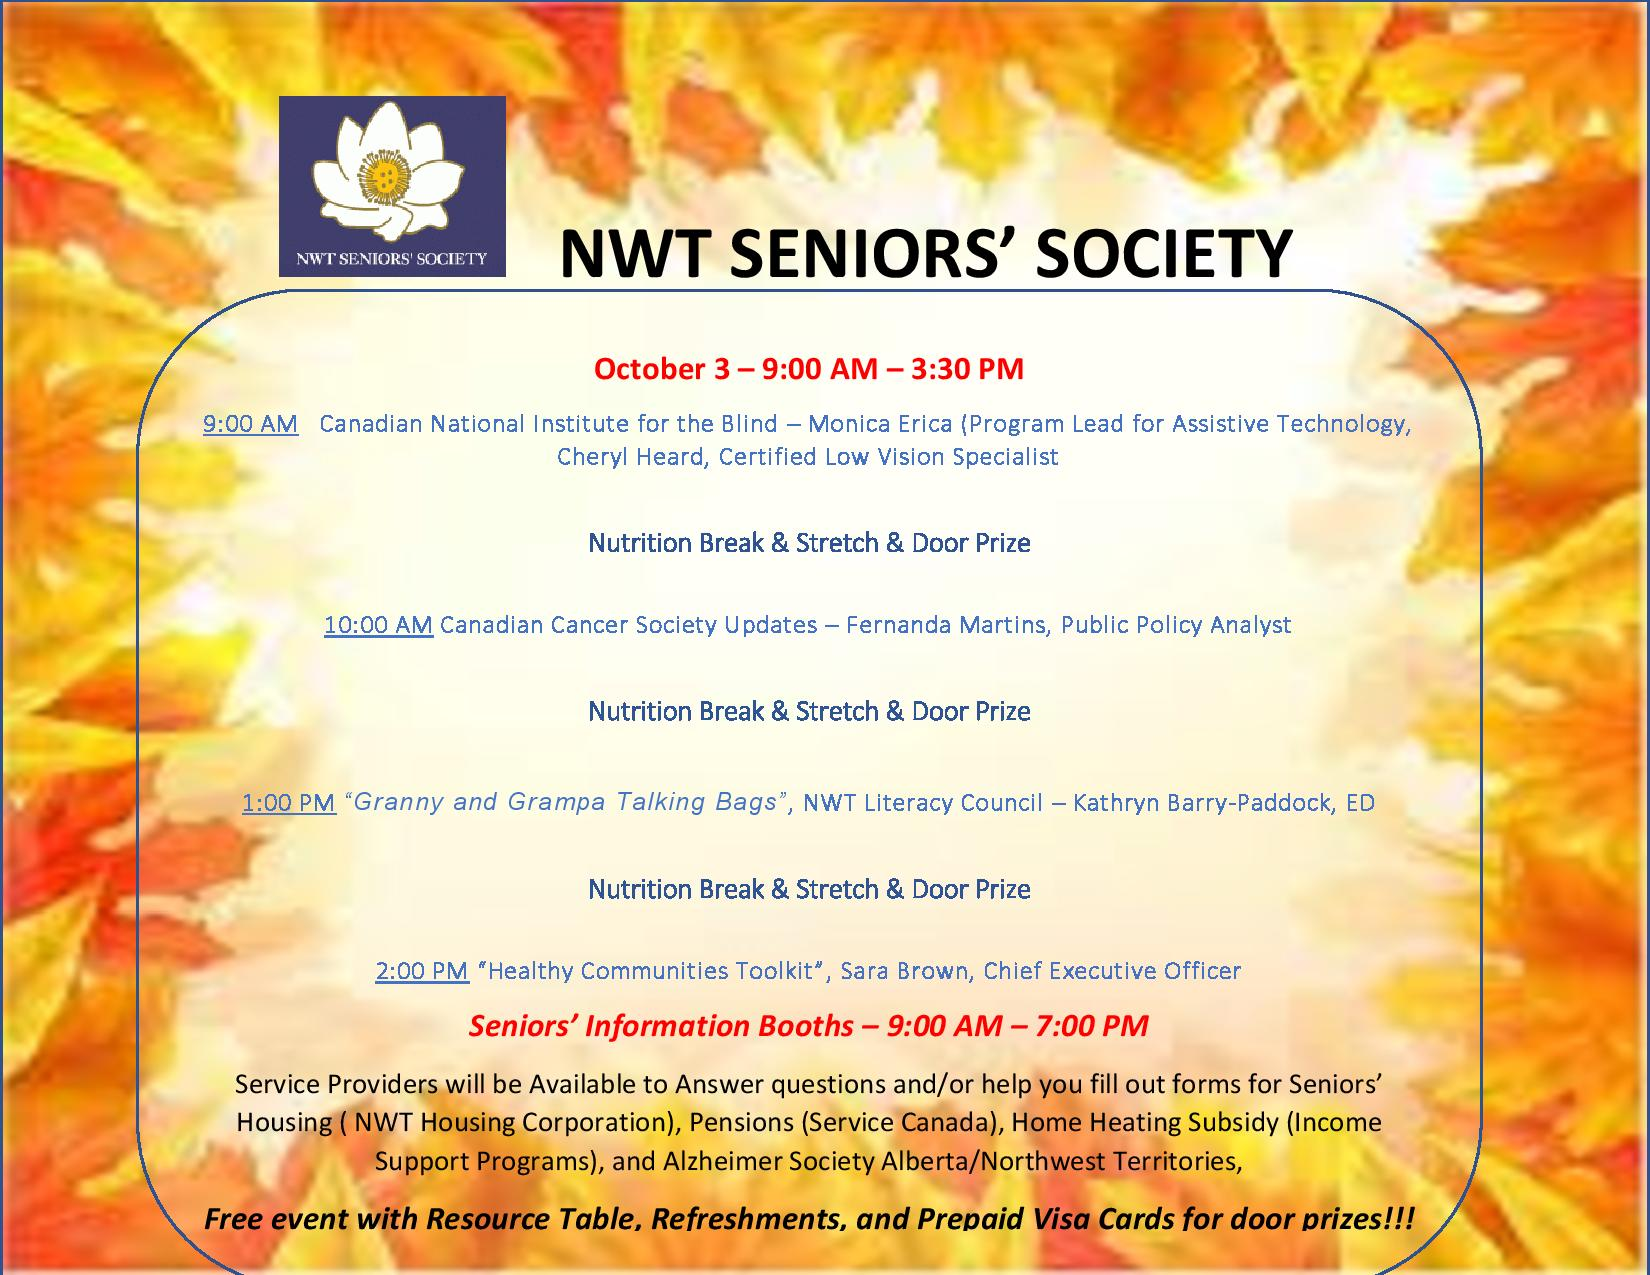 nwt seniors event 2017-page-001.jpg